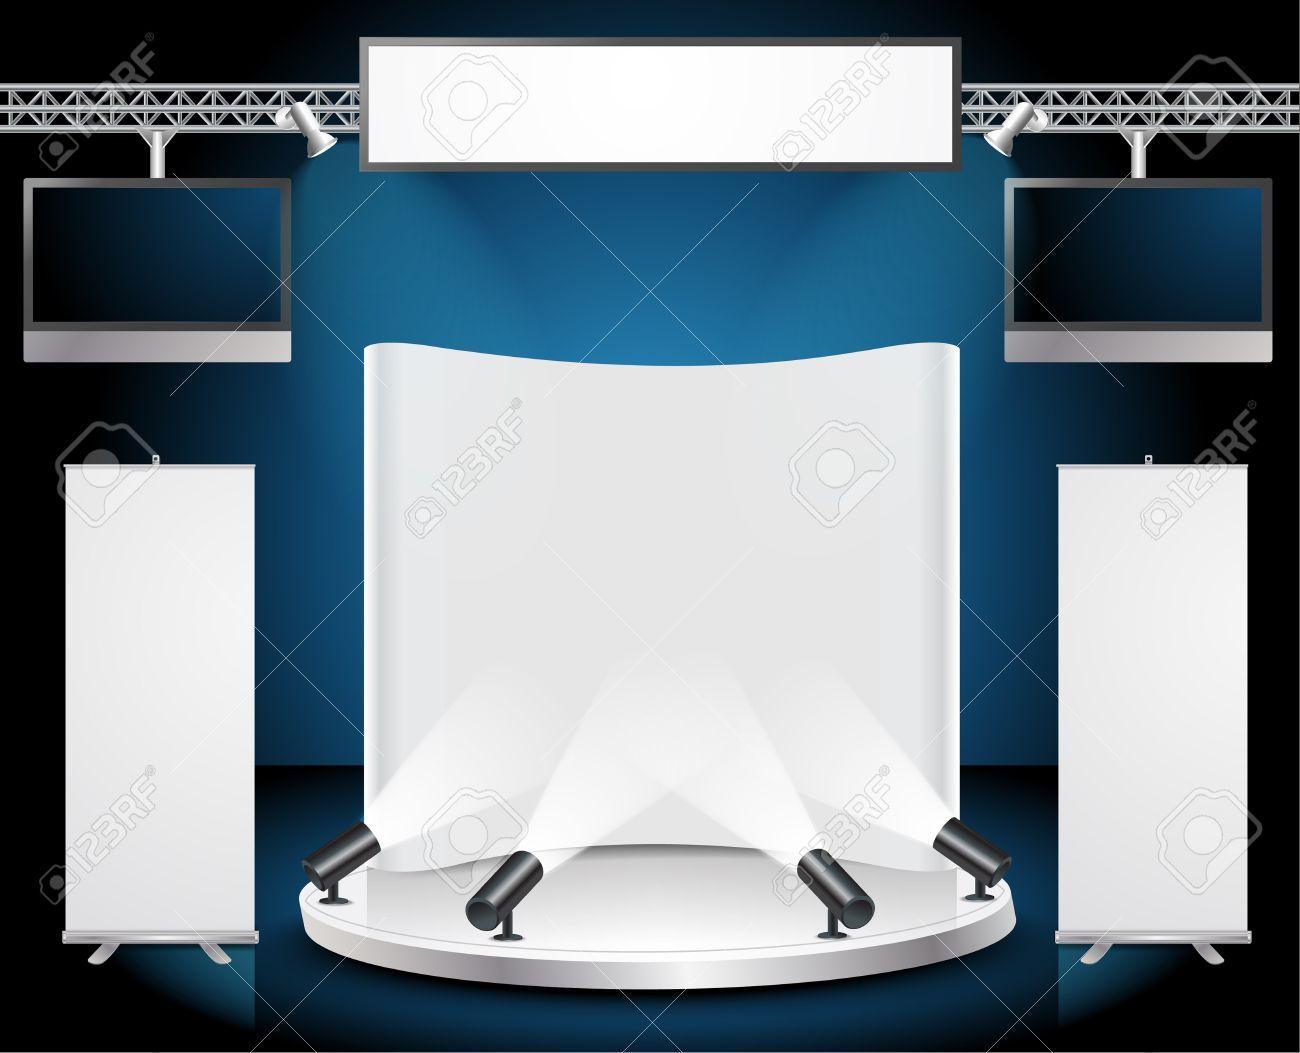 Trade Exhibition Stand Vector : Vector blank trade exhibition stand stock vector royalty free